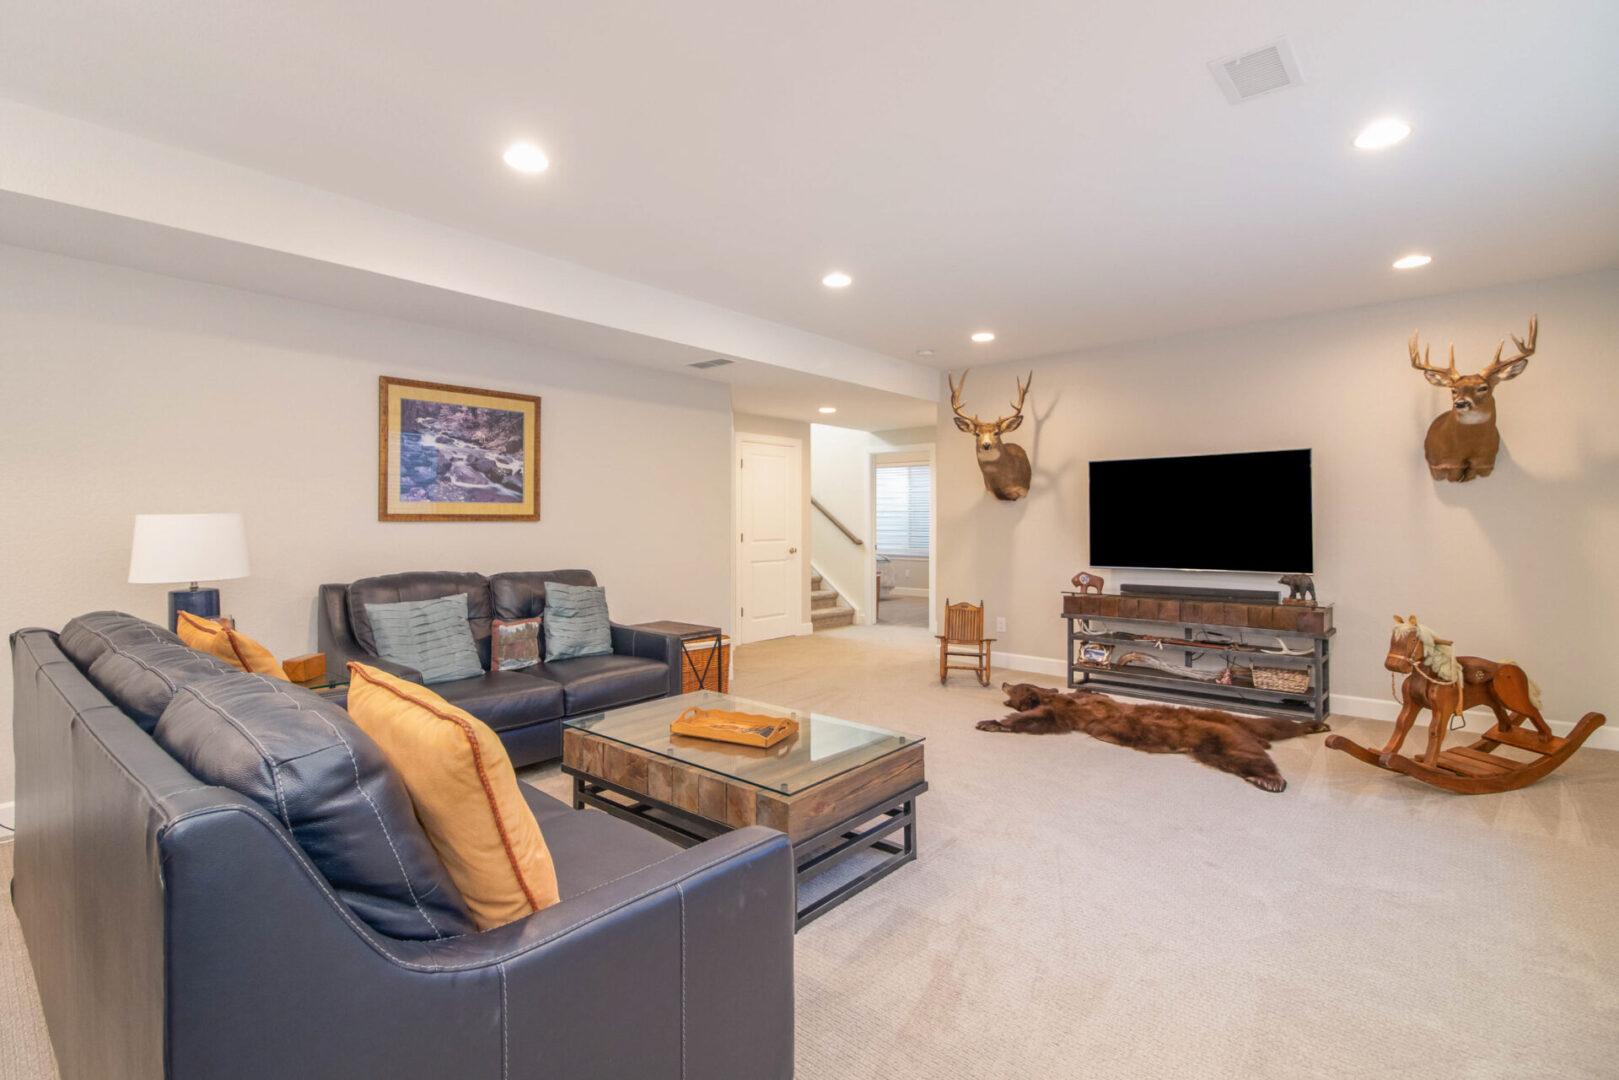 living room with stuffed animal decoration